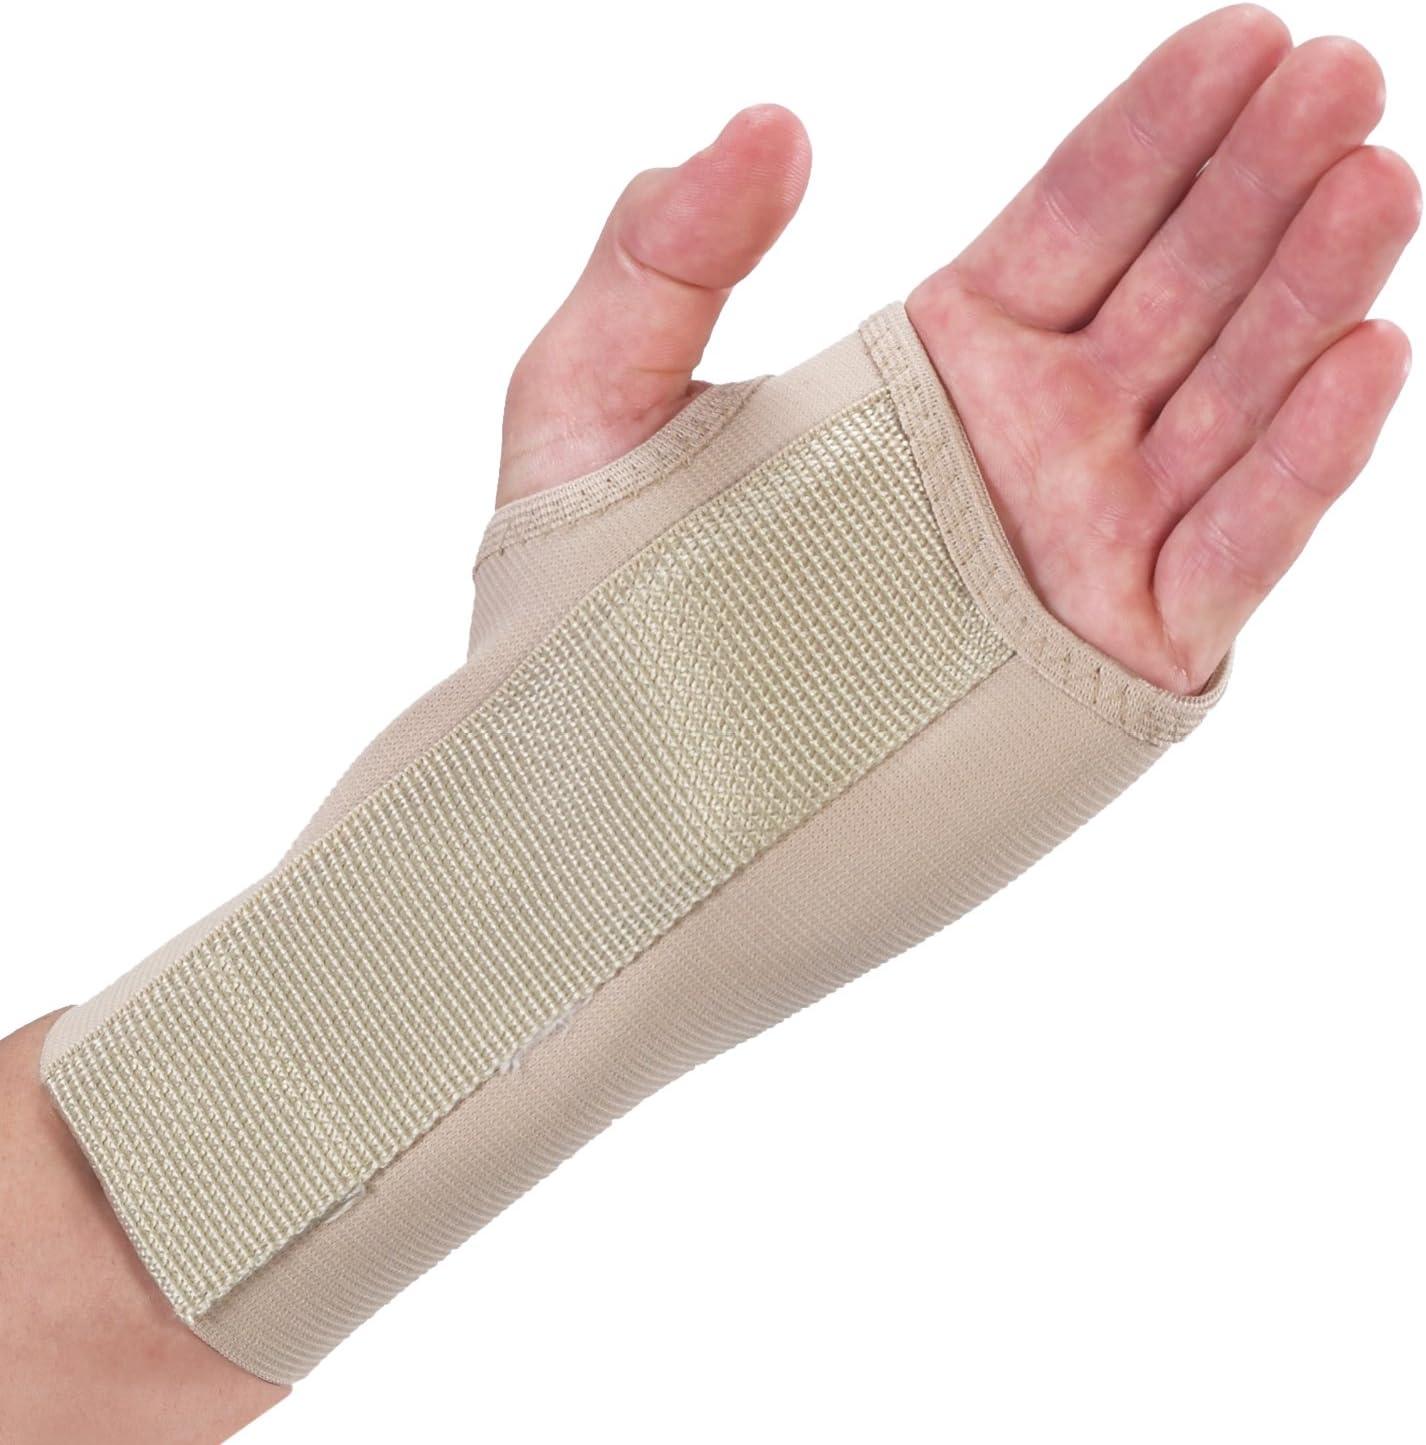 2021 Bilt-Rite Mastex Health 7 Inch Splint Large Left Quantity limited Beige Wrist